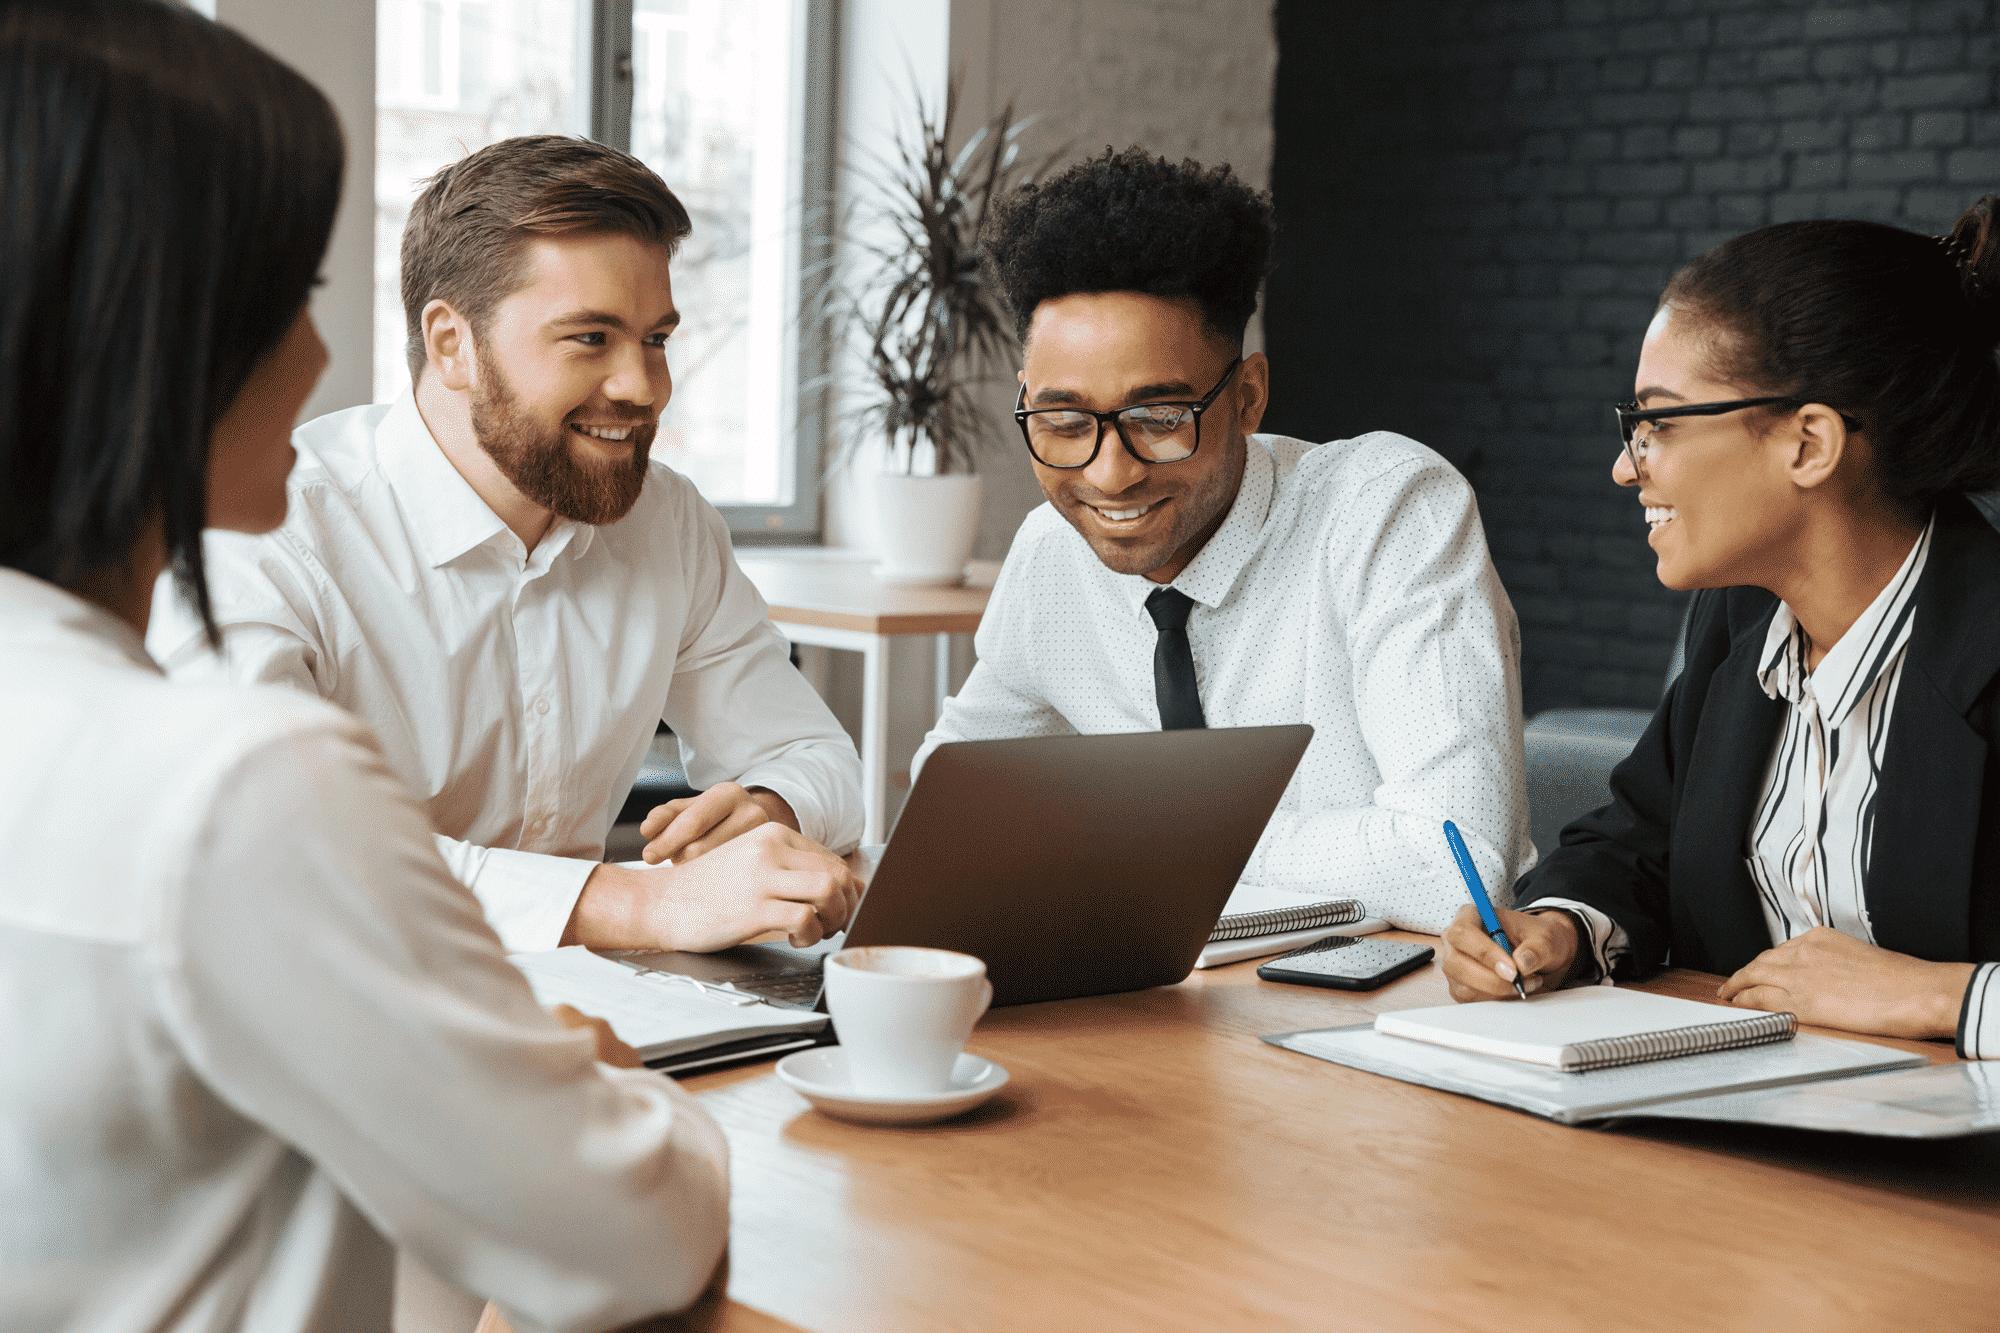 Verandermanager   Change manager   Interim   100% datagedreven